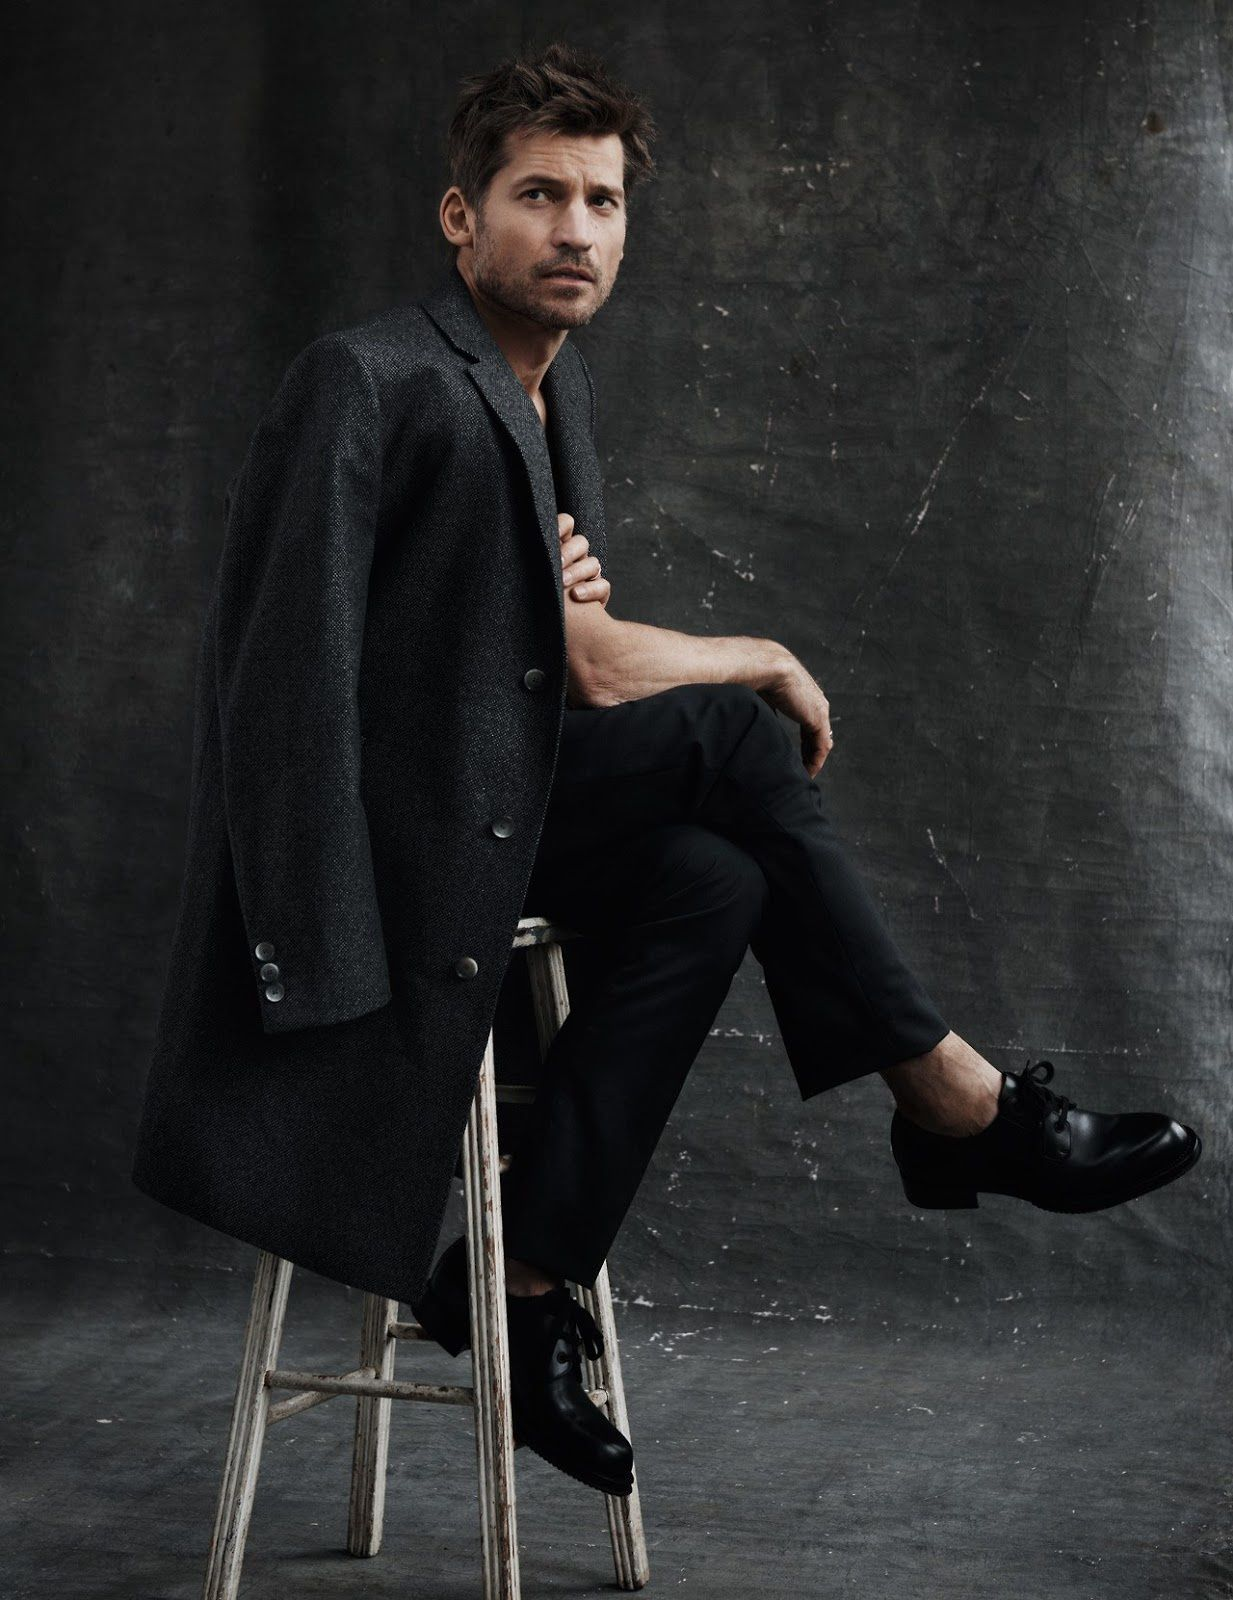 Nikolaj Coster-Waldau par Johan Sandberg